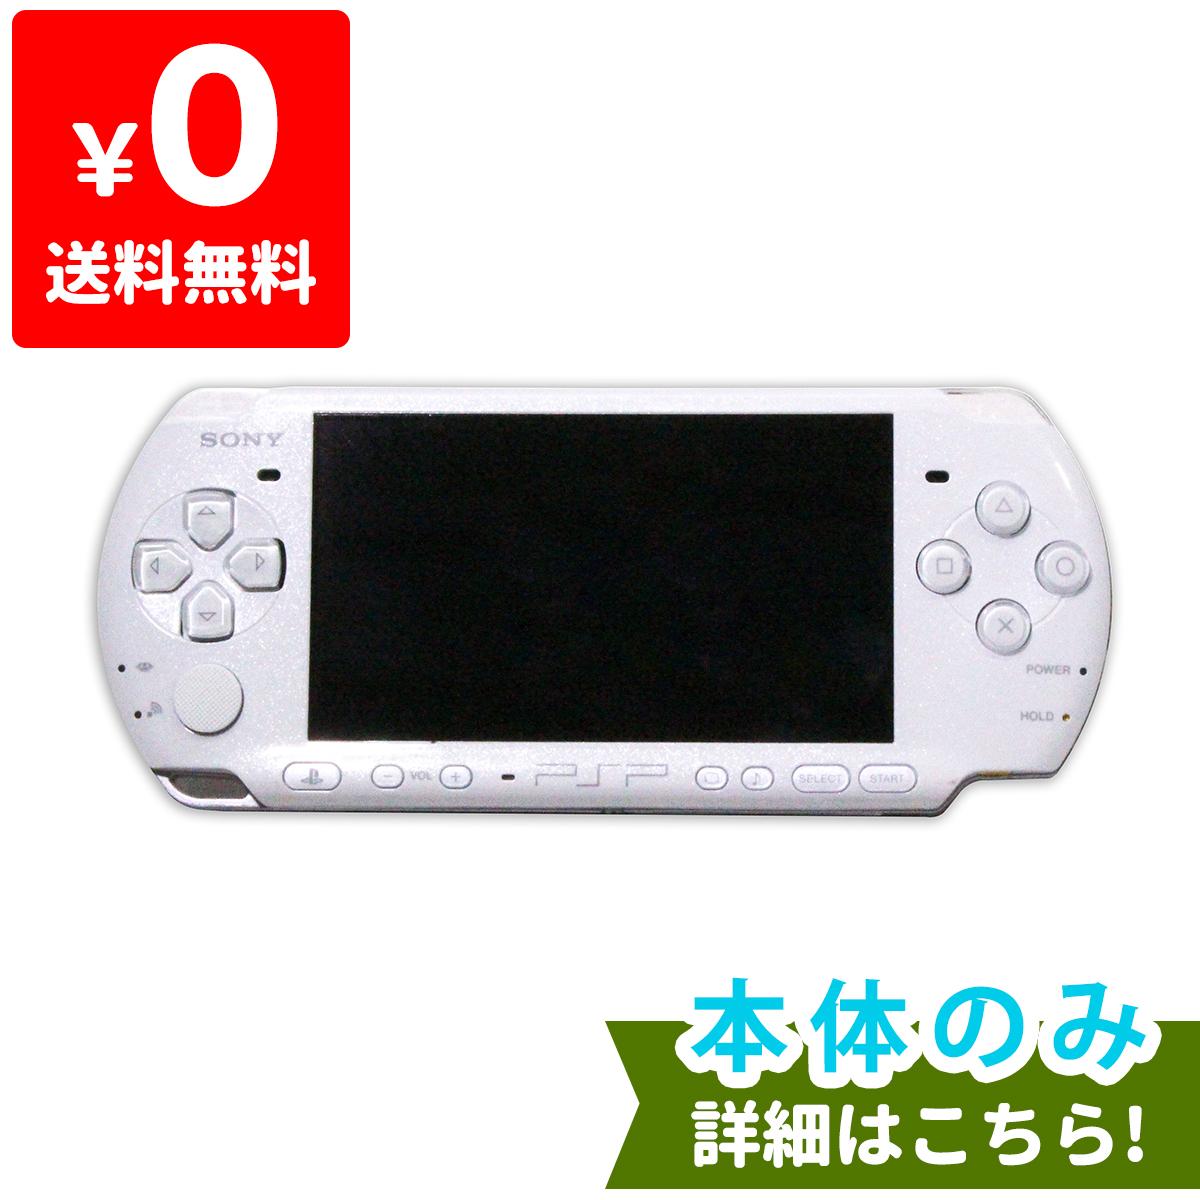 PSP 3000 パール・ホワイト PSP-3000PW 本体のみ PlayStationPortable SONY ソニー 中古 4948872411981 送料無料 【中古】